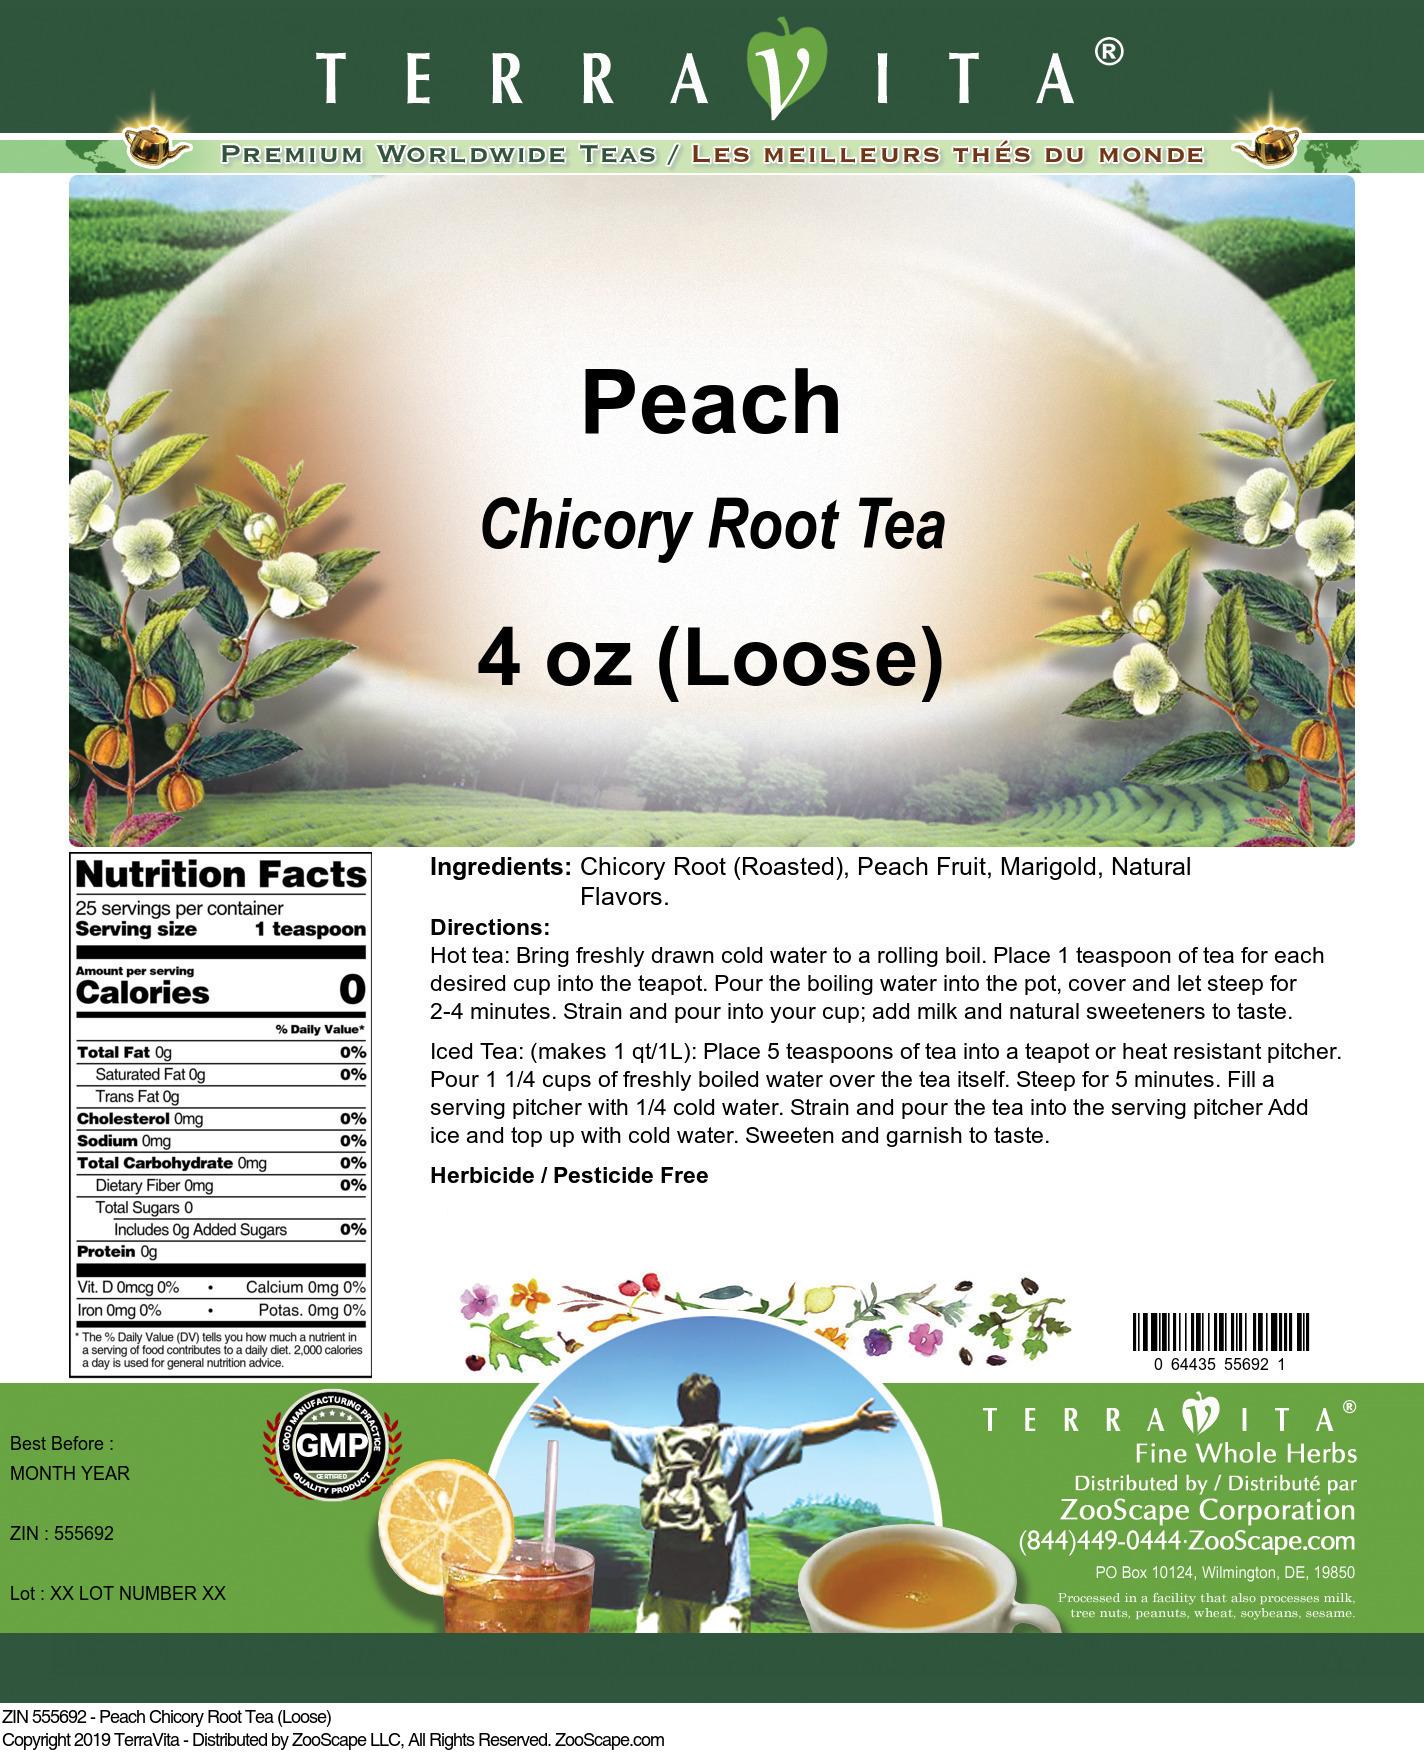 Peach Chicory Root Tea (Loose)